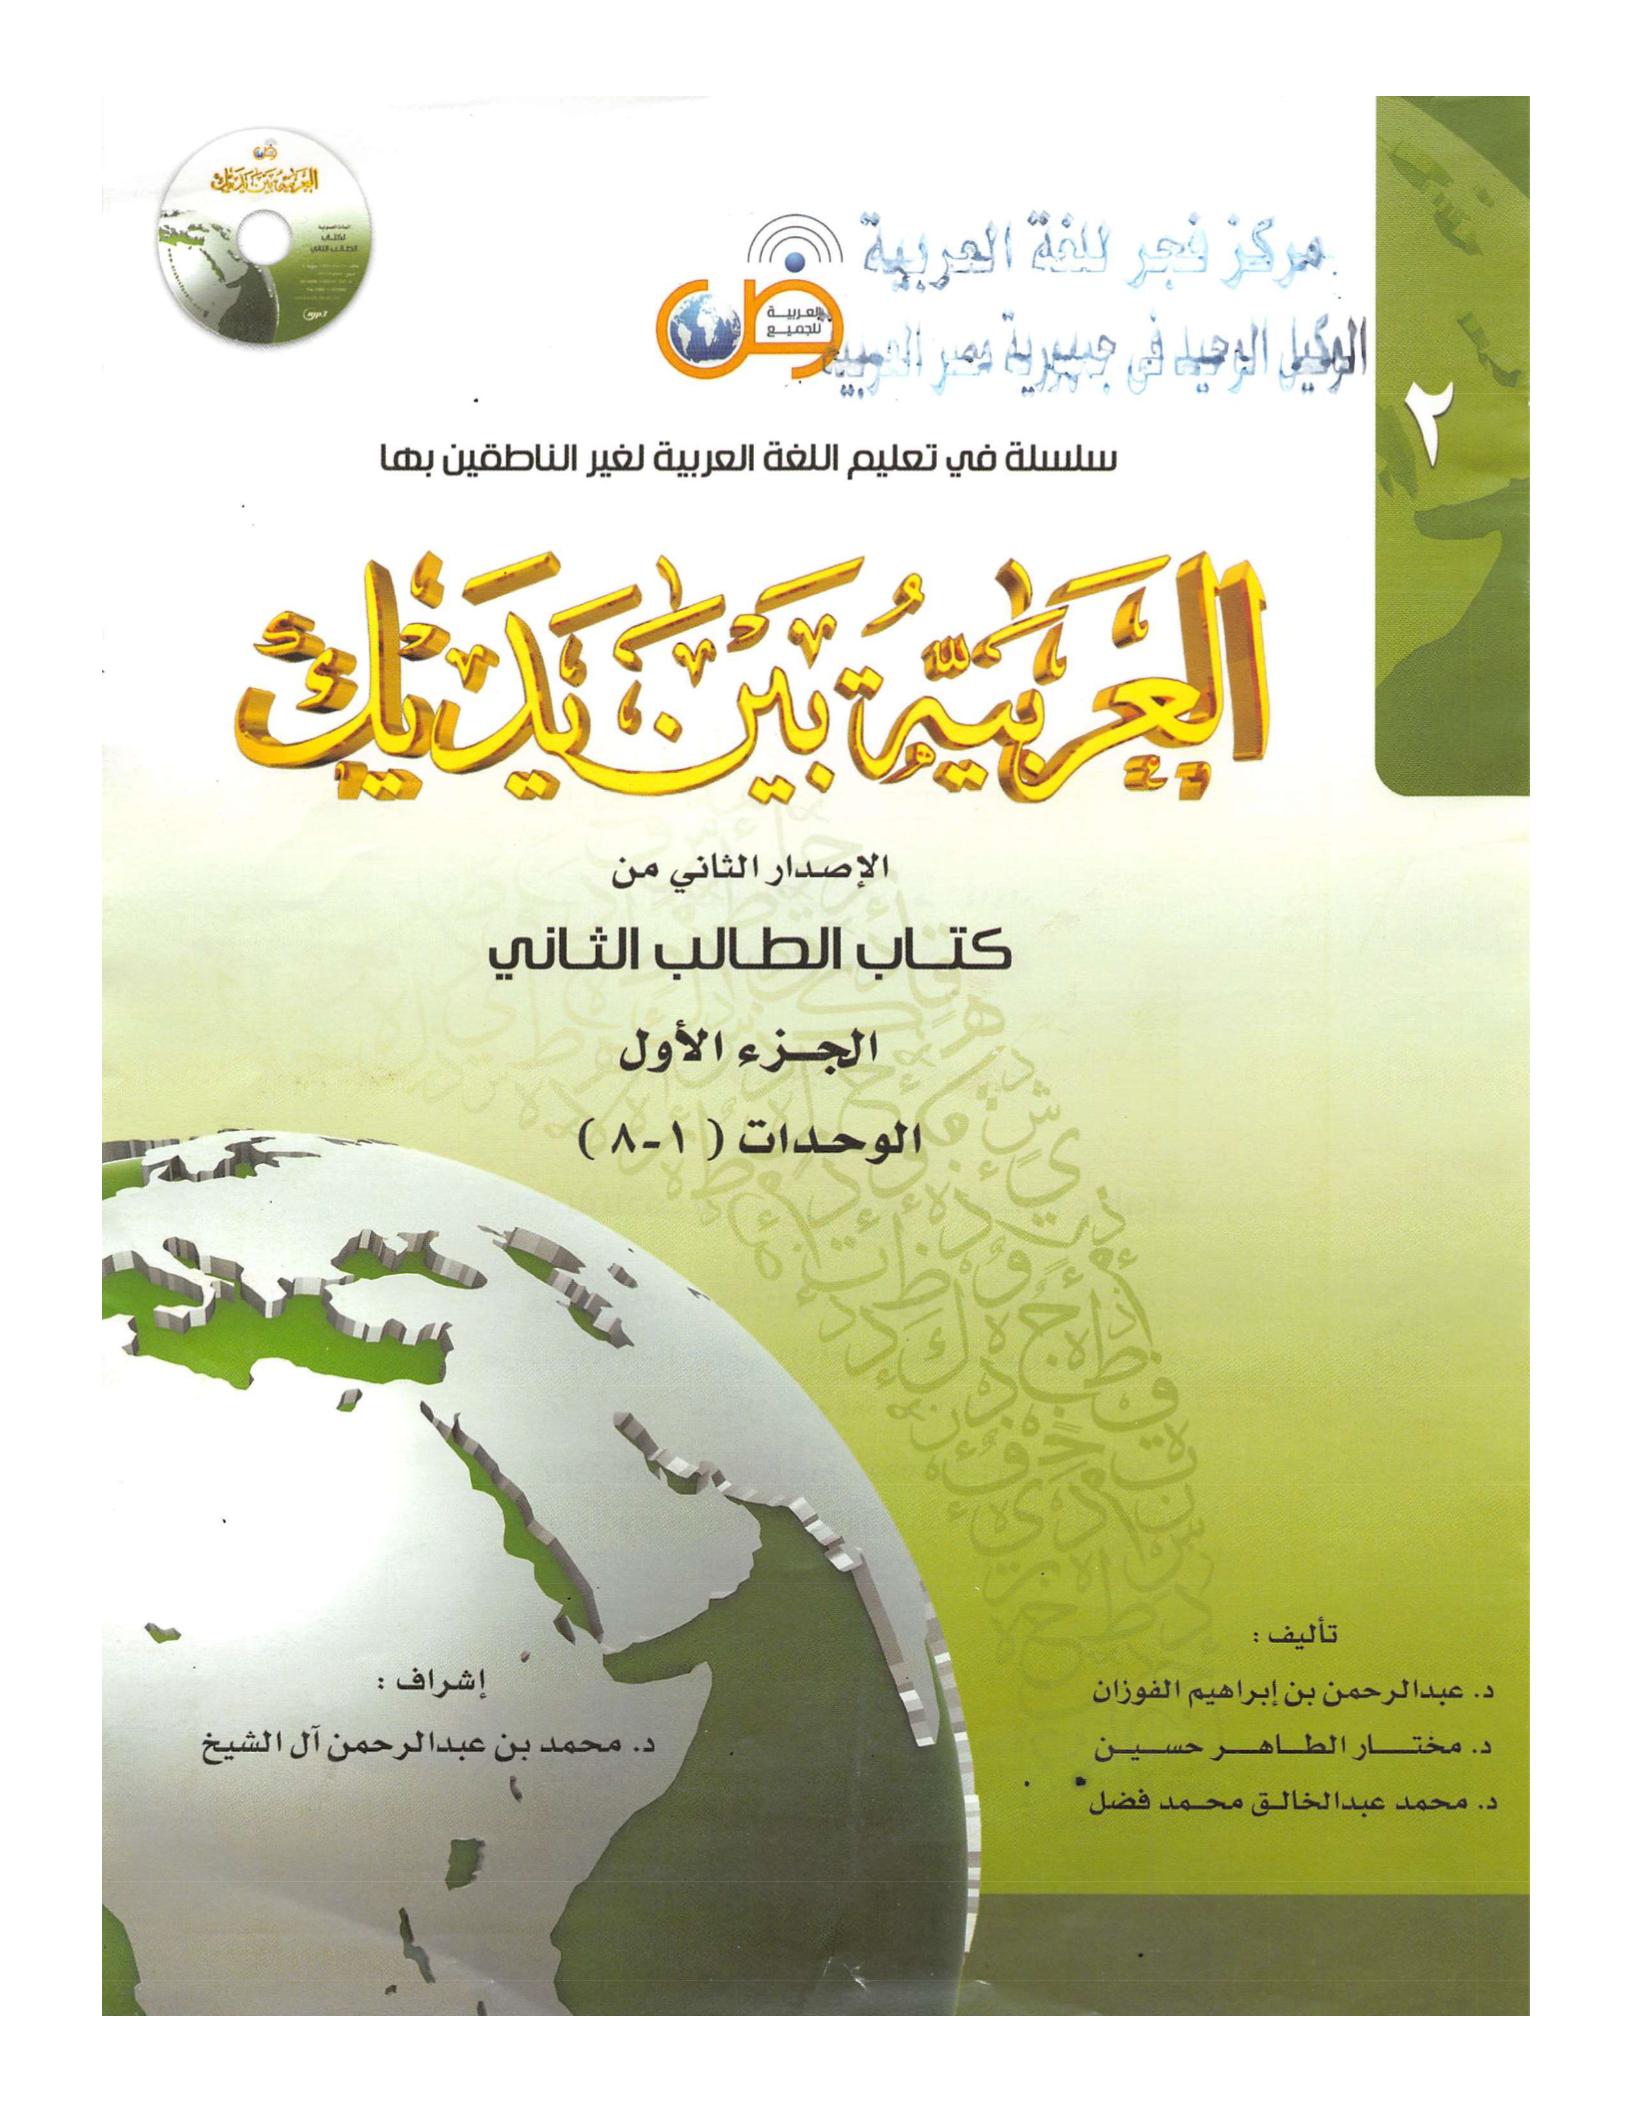 Al Arabiyatu Bayna Yadayka